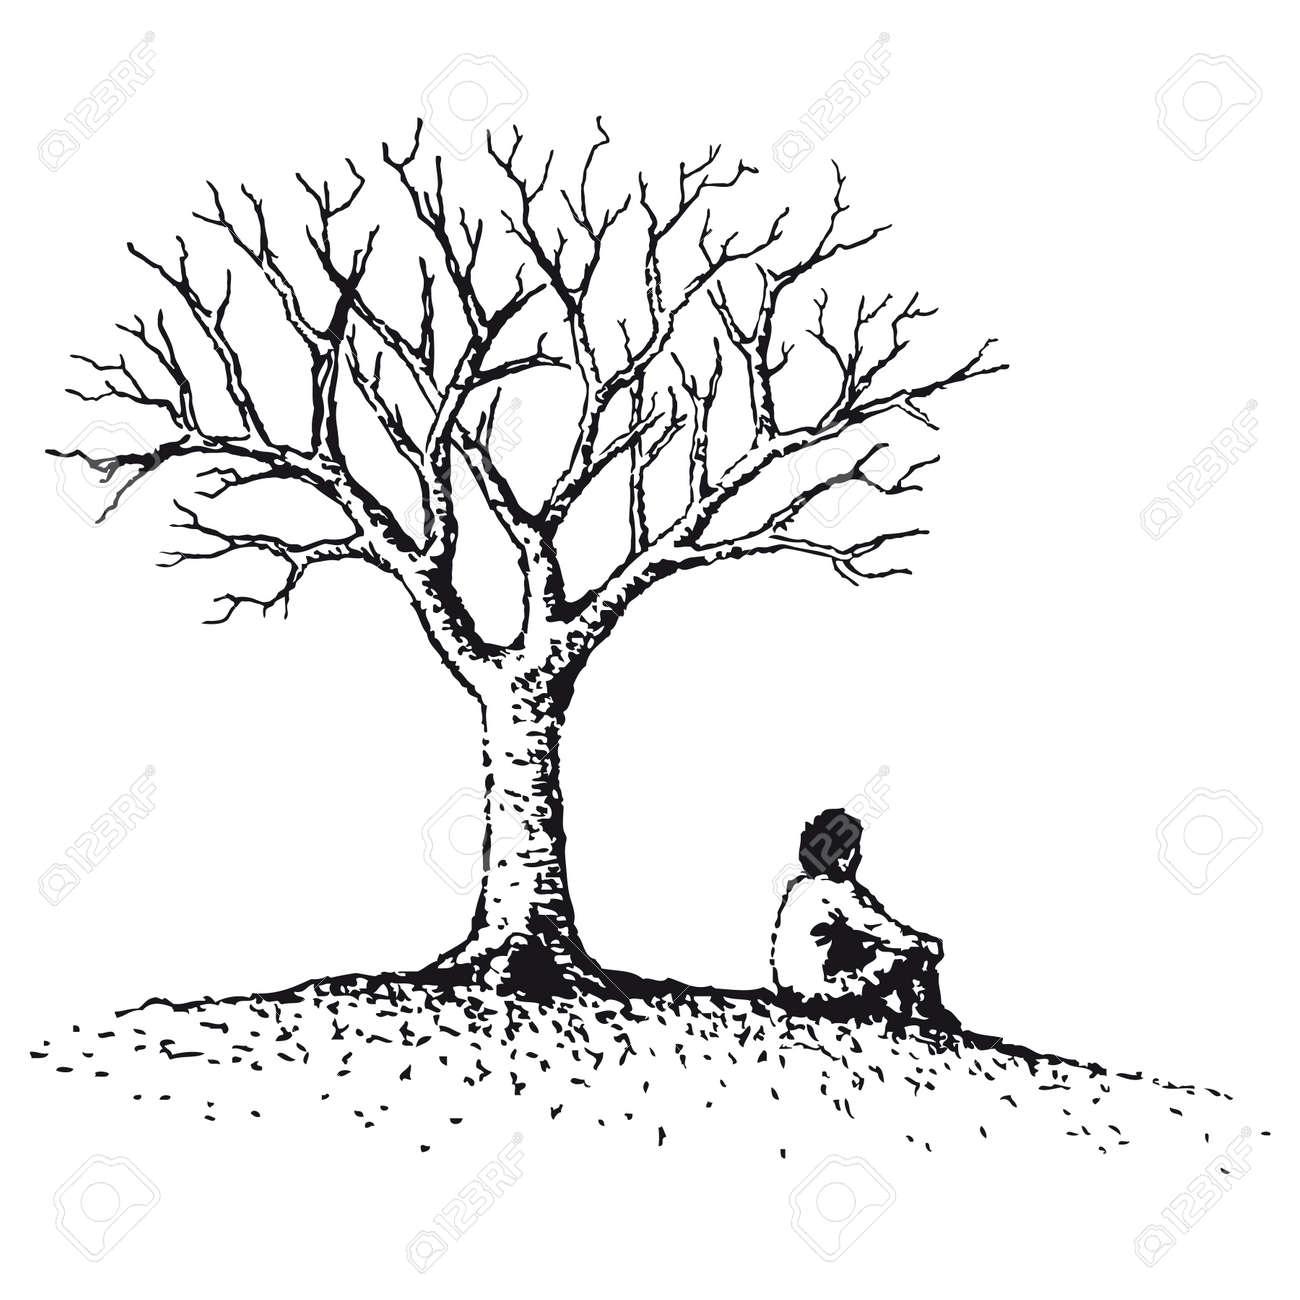 Man sitting Stock Vector - 10736881